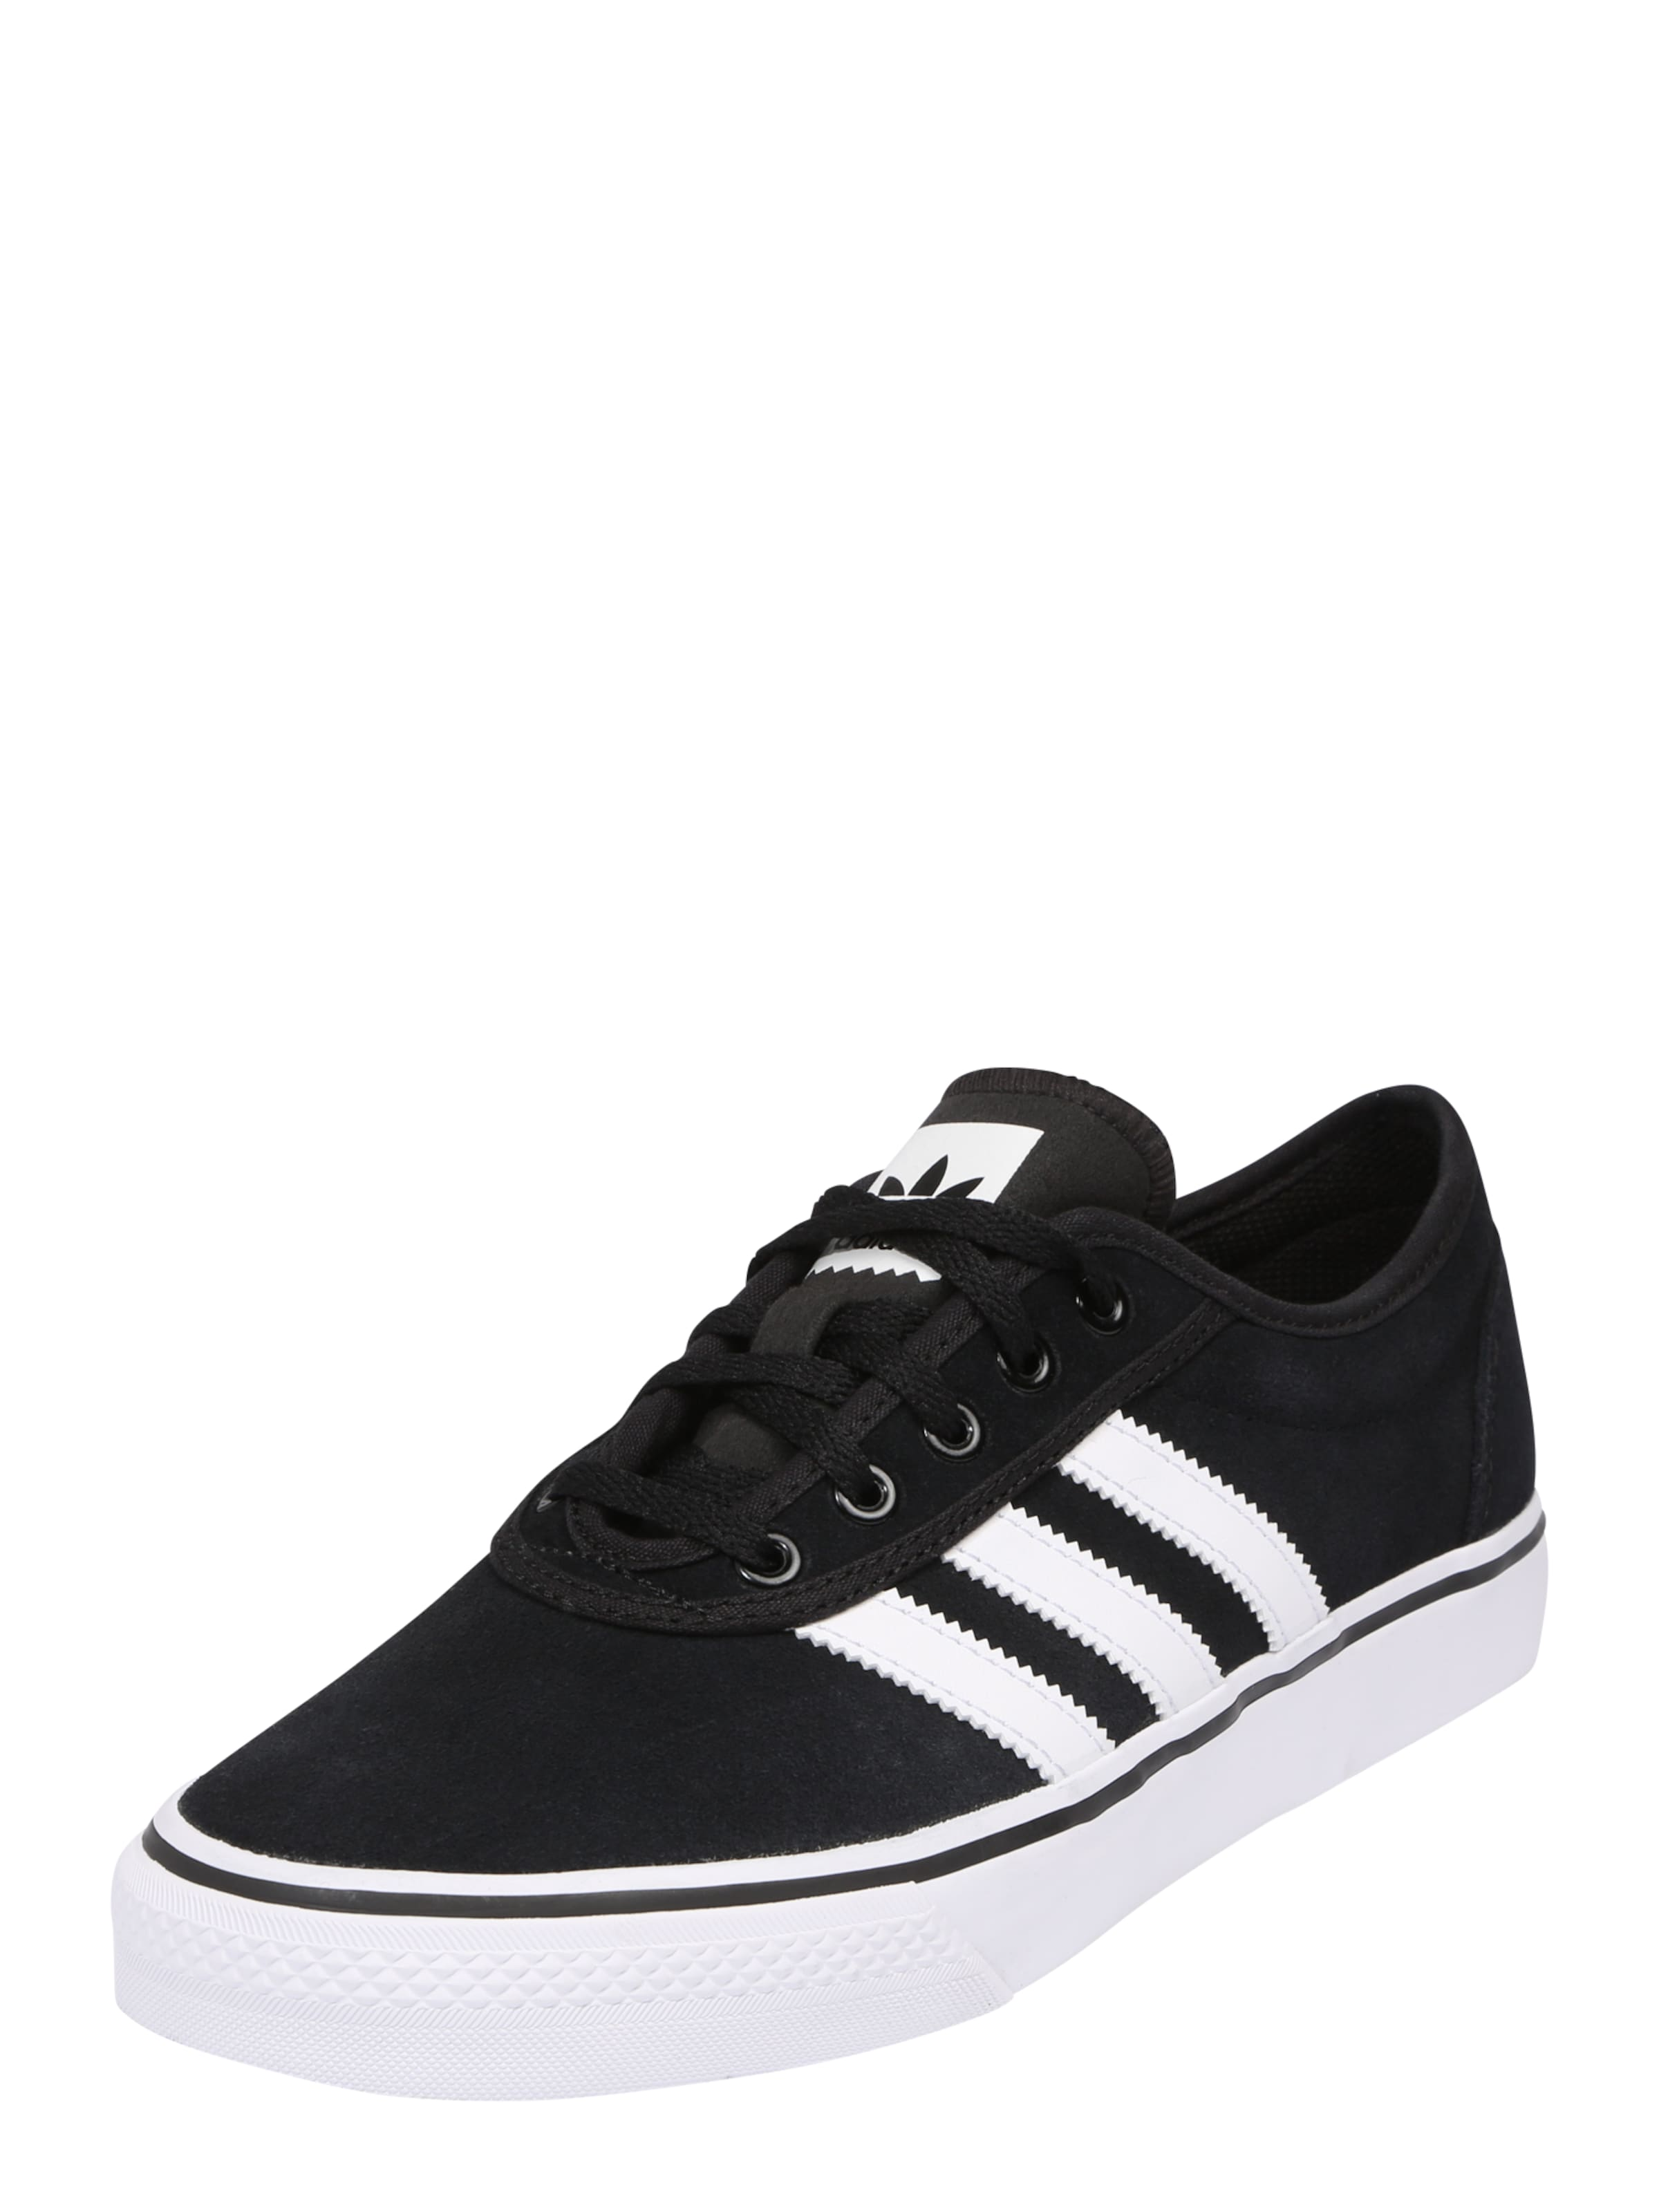 Haltbare Mode billige Schuhe ADIDAS ORIGINALS | SNeaker 'ADI-EASE' Schuhe Gut getragene Schuhe